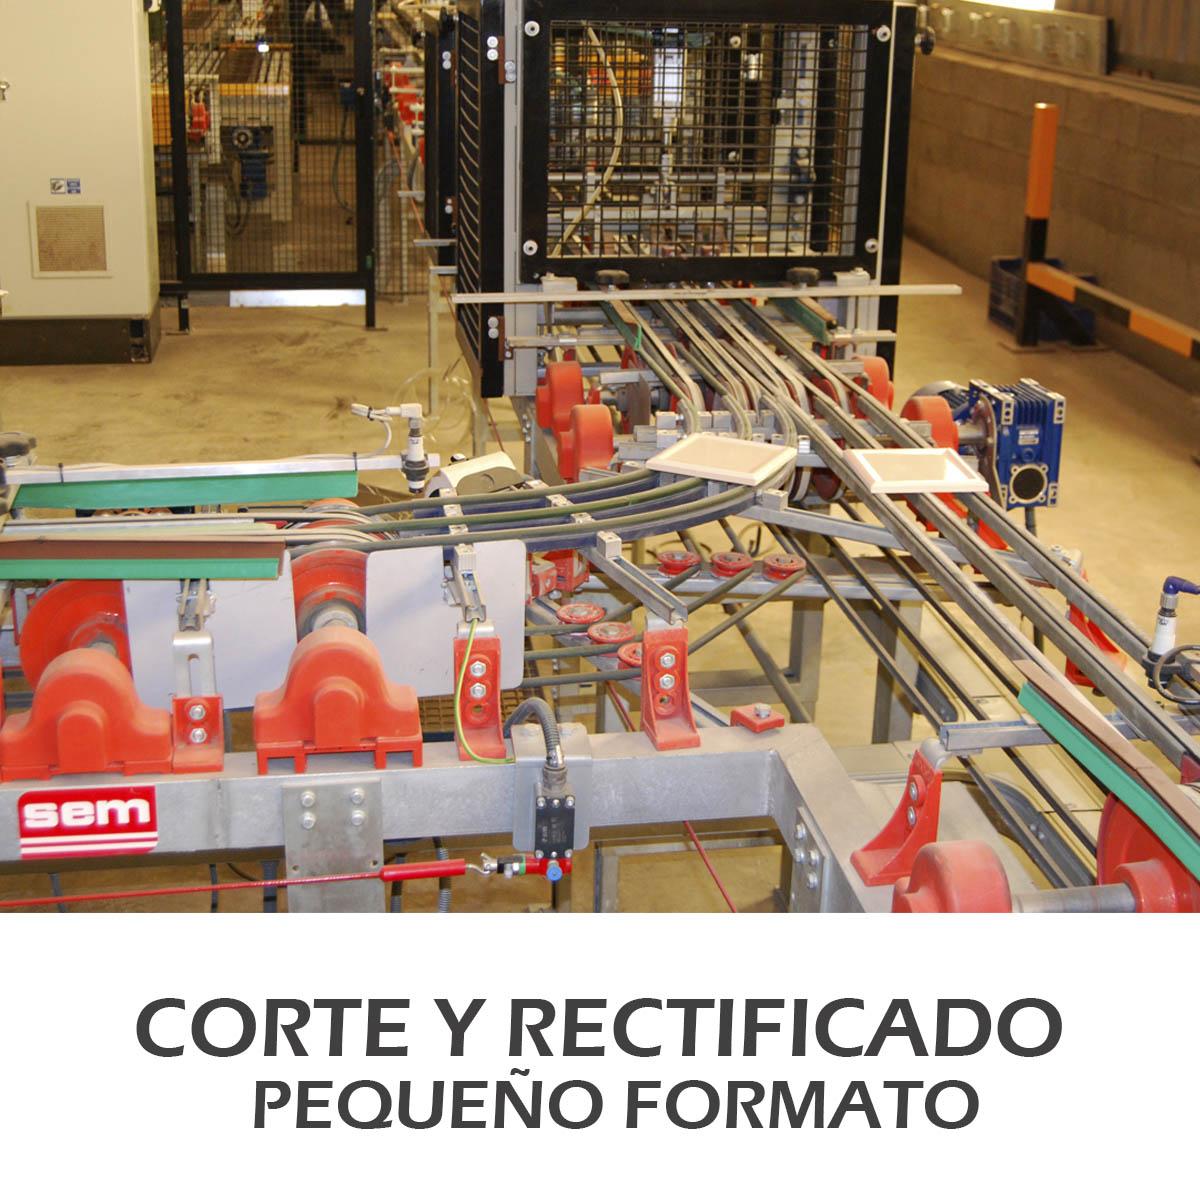 boton-máquina-corte-pequeño-formato-xs-cortadora-rectificadora-SEM